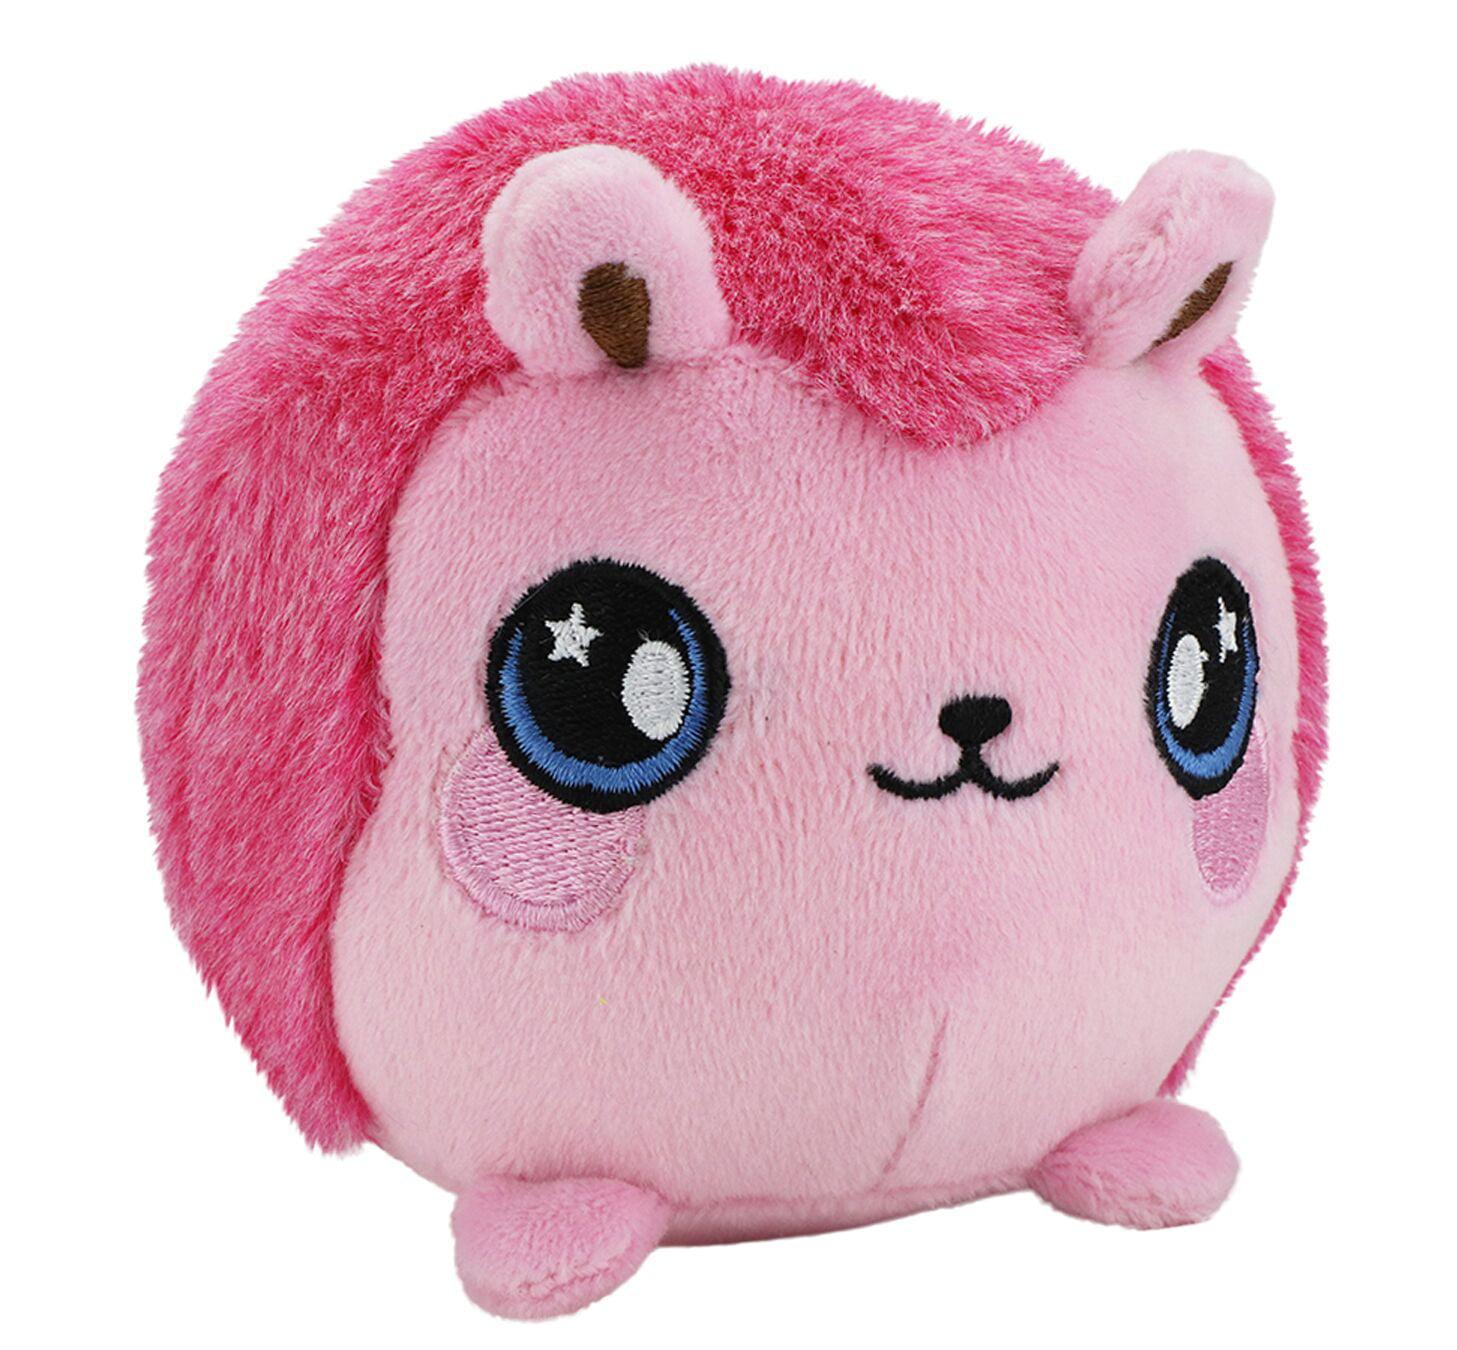 "Squeezamals, Hopey Hedgehog - 3.5"" Super-Squishy Foam Stuffed Animal! Squishy, Squeezable, Cute, Soft, Adorable!"